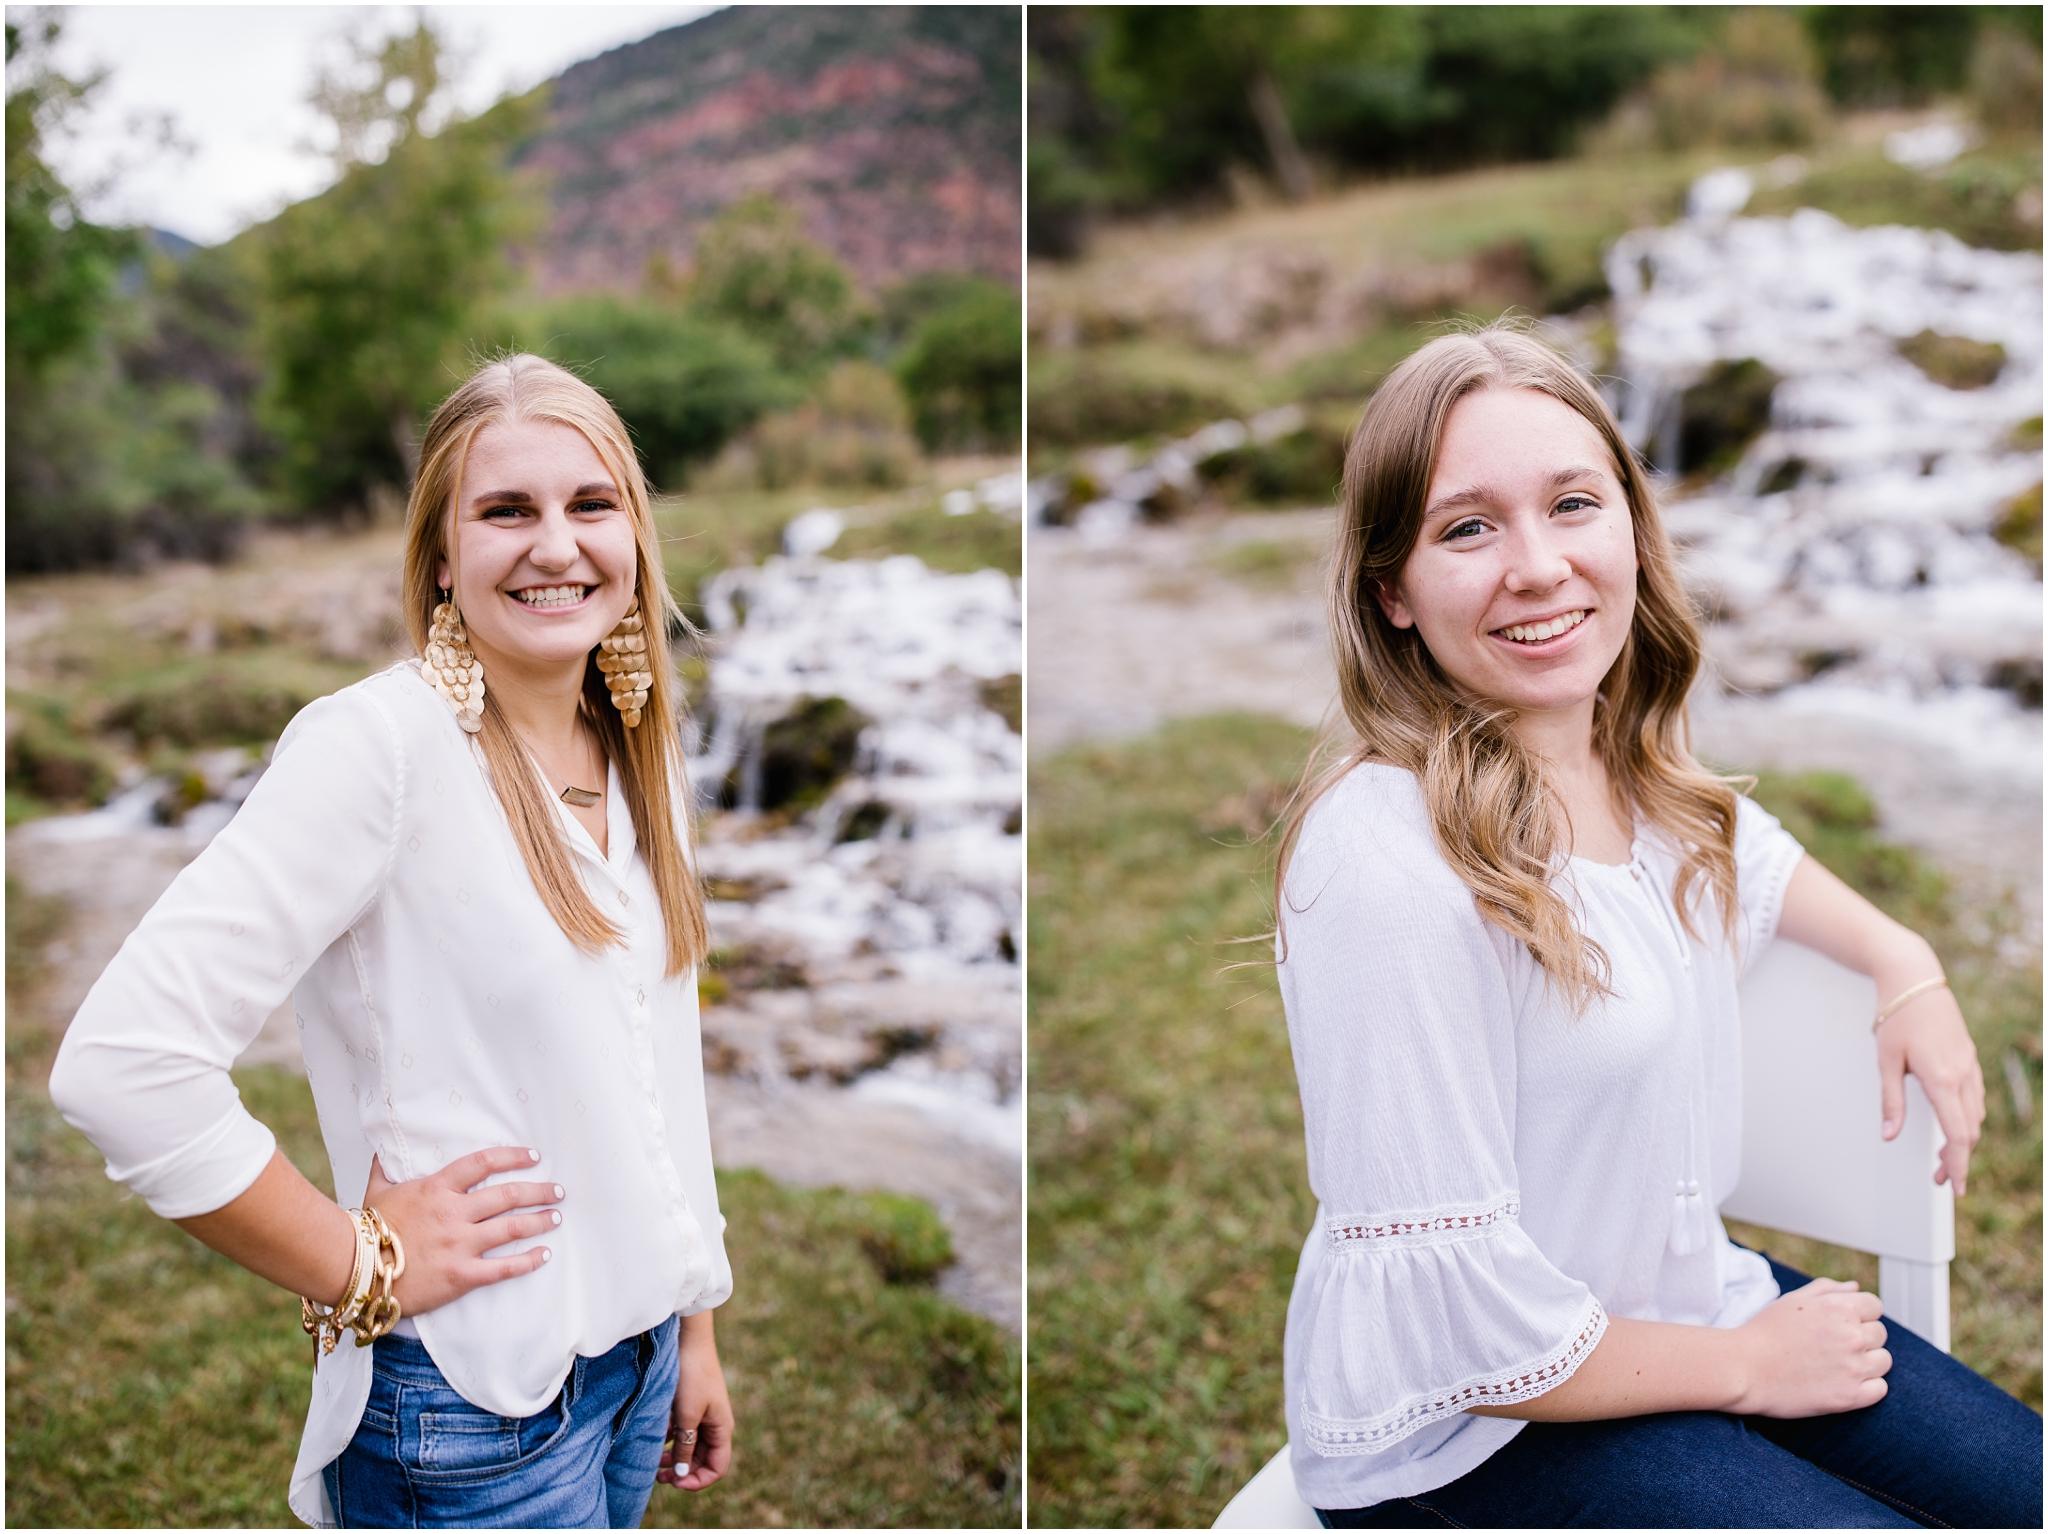 GVHSDRILL-70_Lizzie-B-Imagery-Utah-Family-Photographer-Central-Utah-Park-City-Salt-Lake-City-Drill-Team-Photography-Dance.jpg